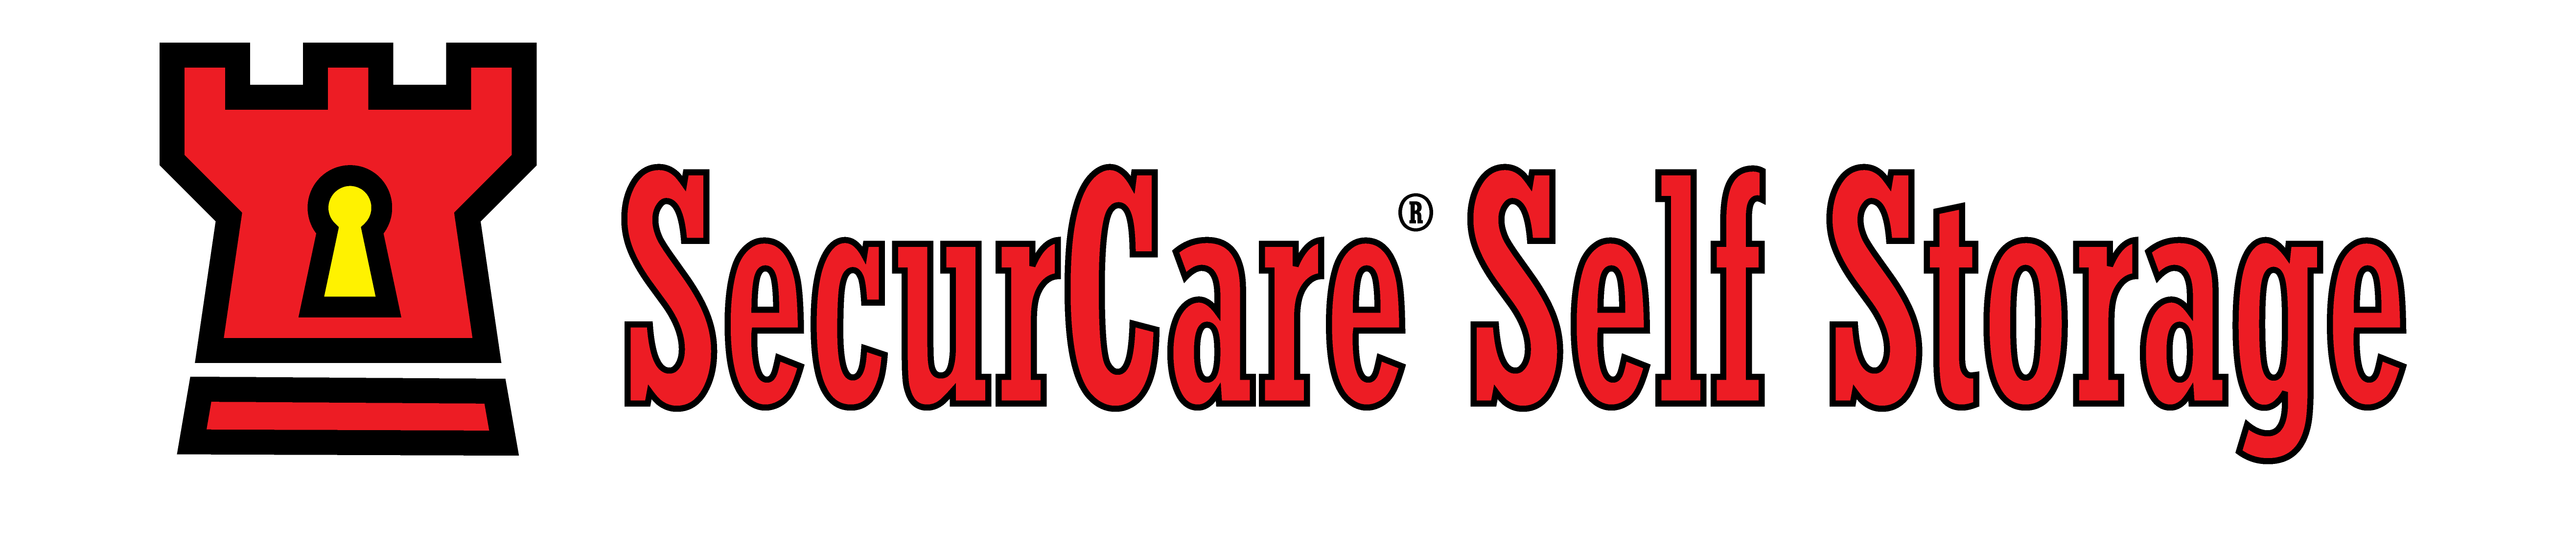 Securcare Self Storage Career Page